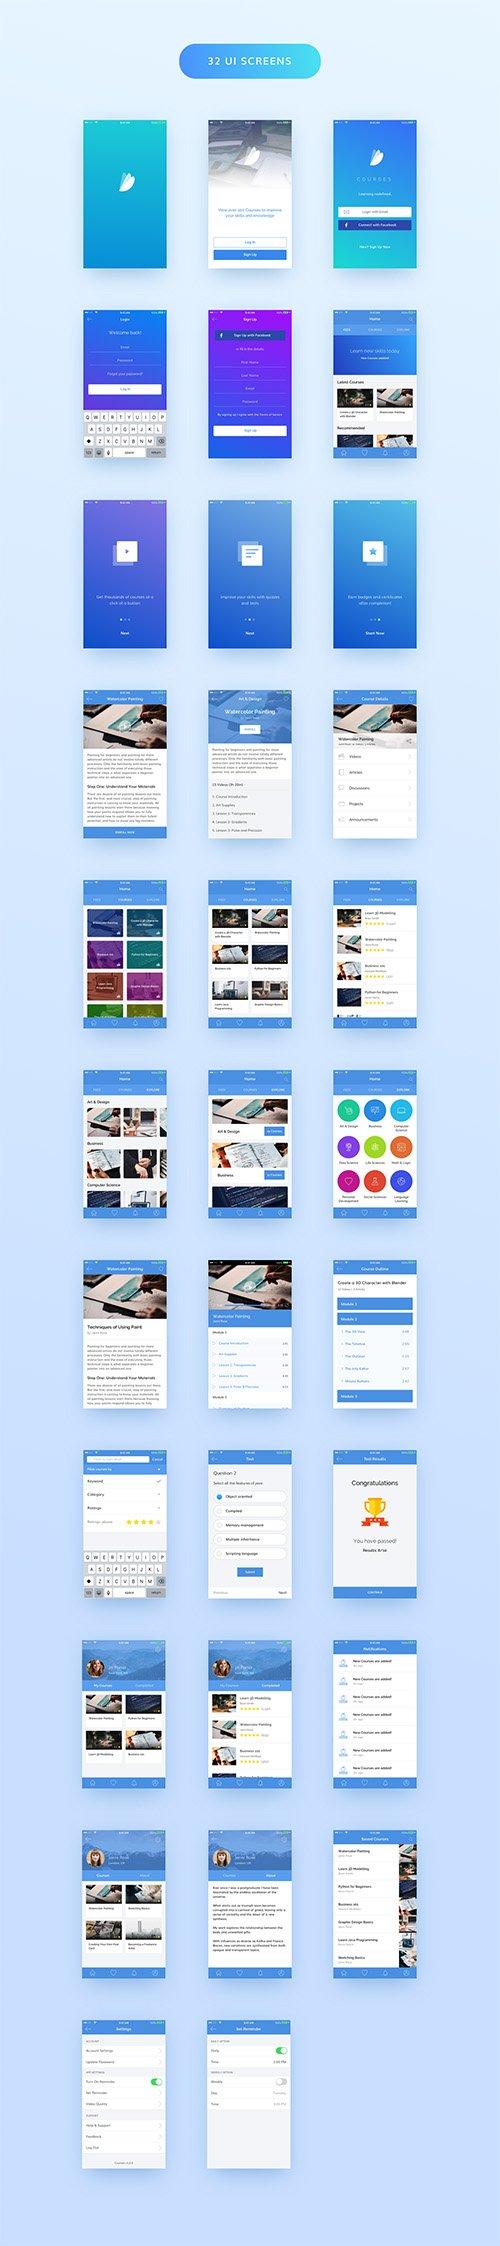 Courses iOS UI Kit